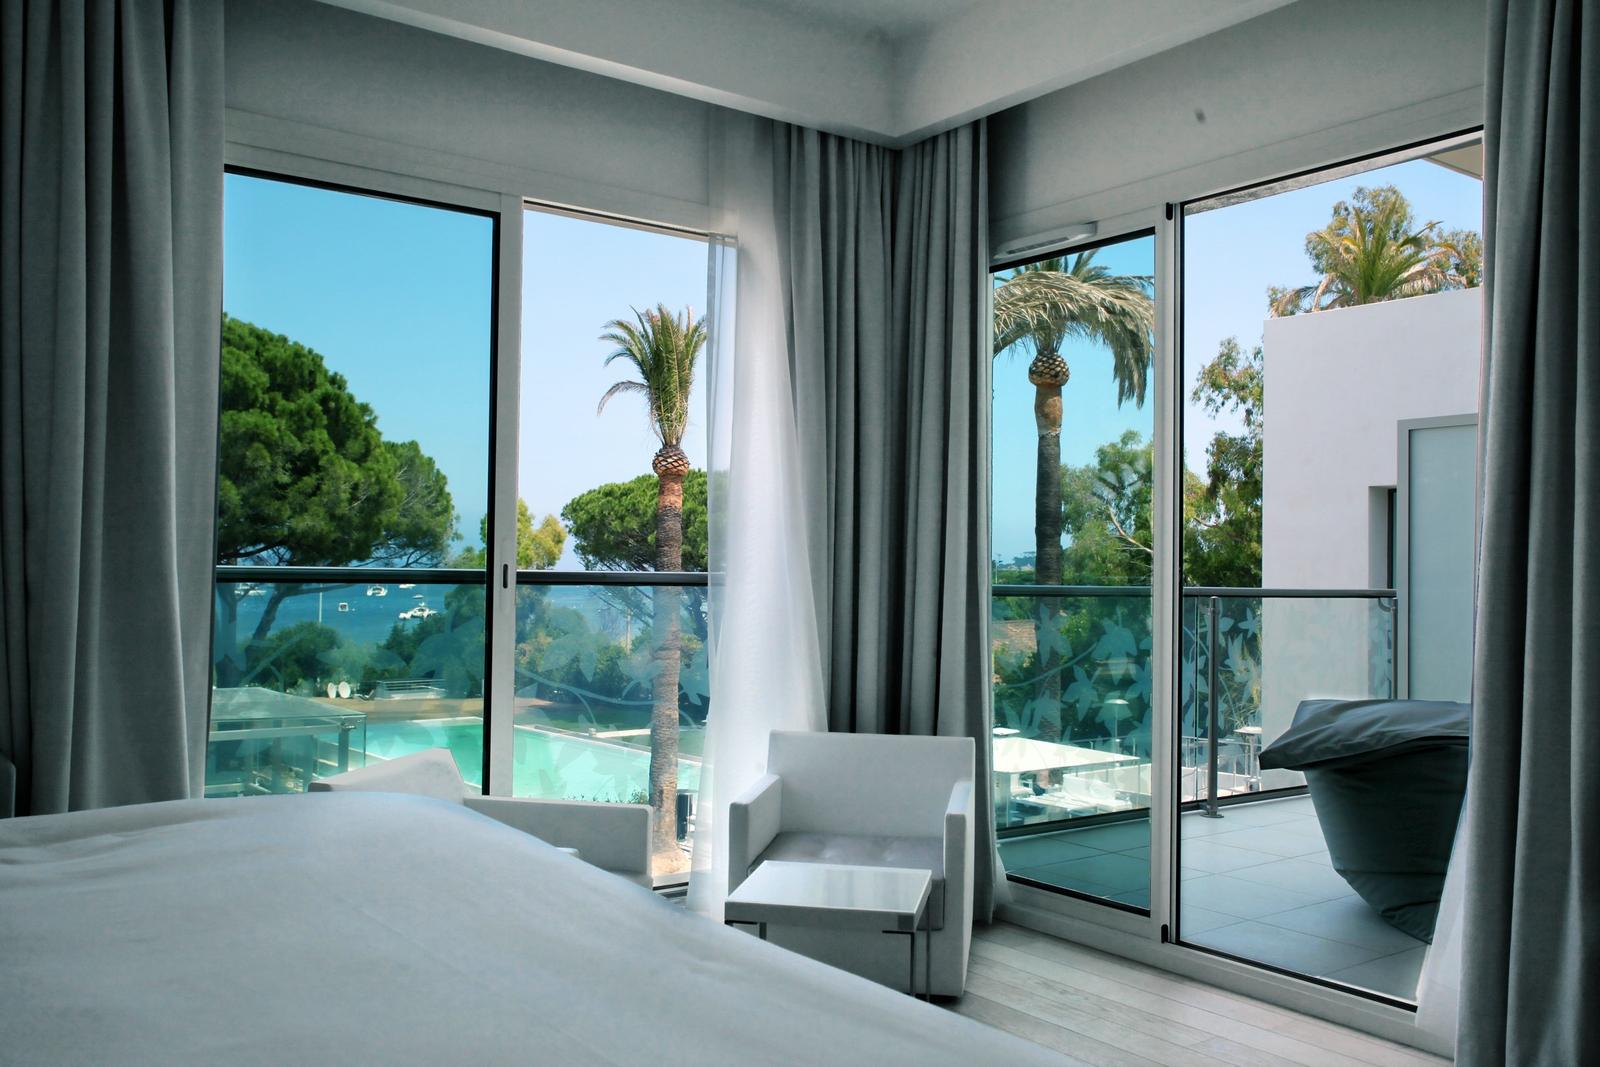 kube-hotel-saint-tropez-1